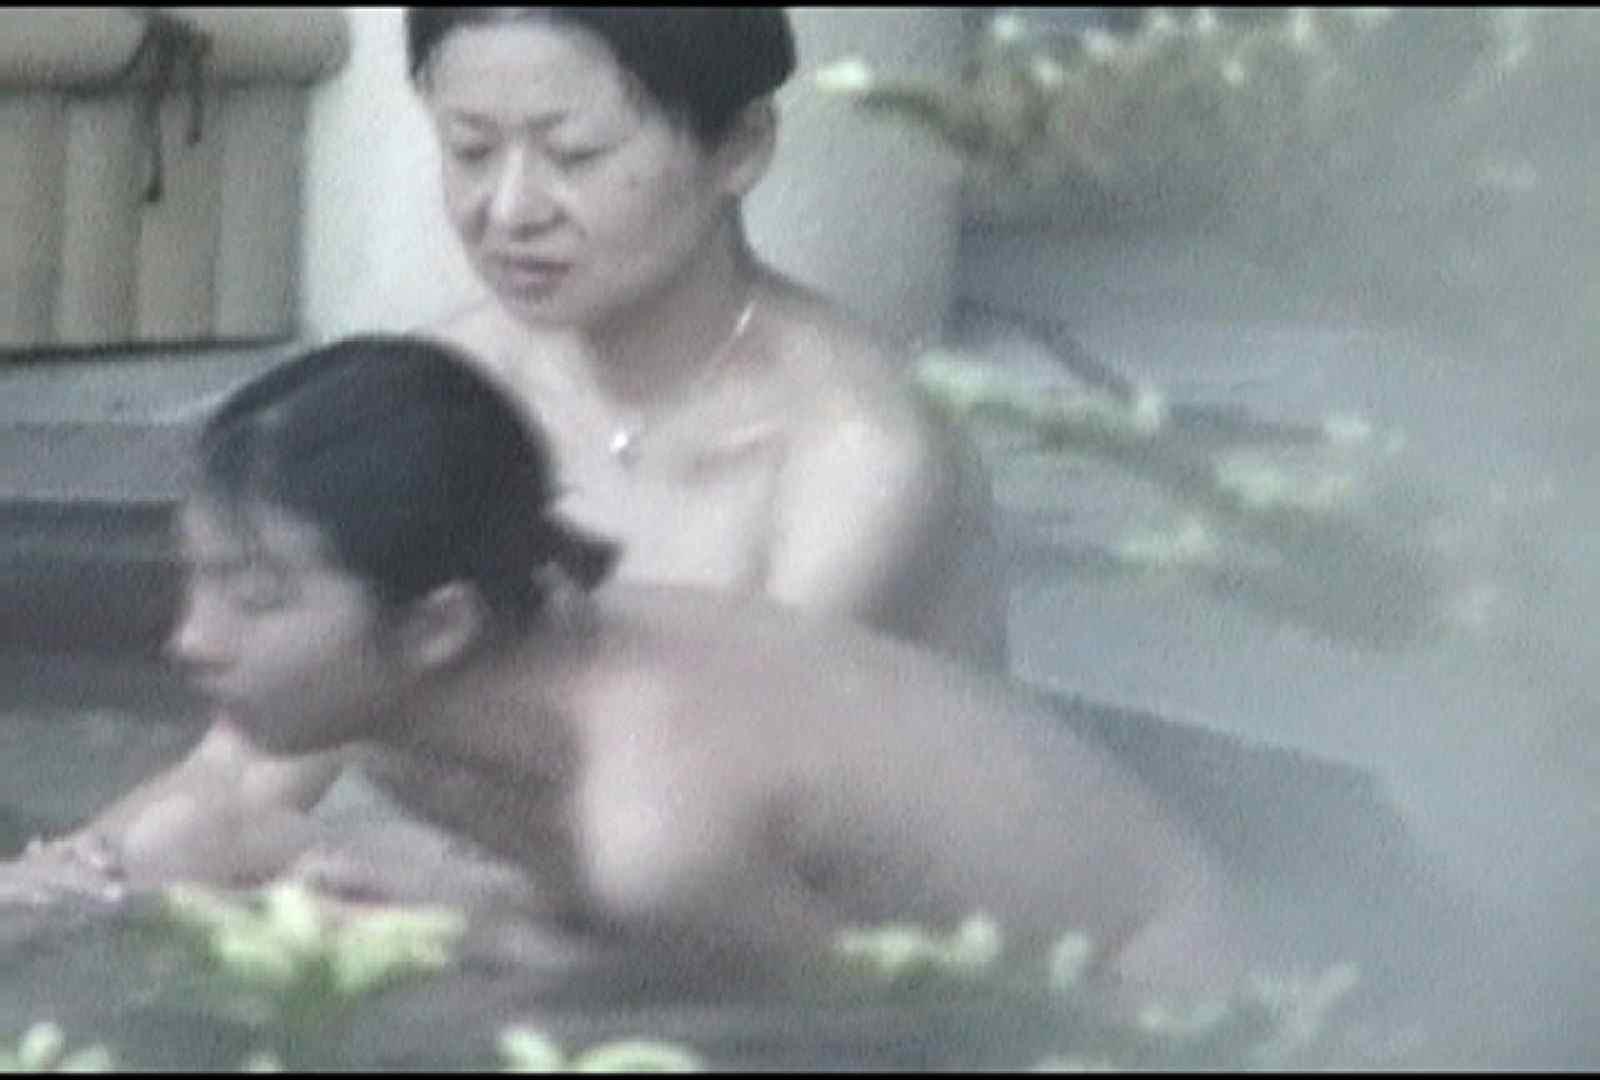 Aquaな露天風呂Vol.15 盗撮映像  42Pix 29